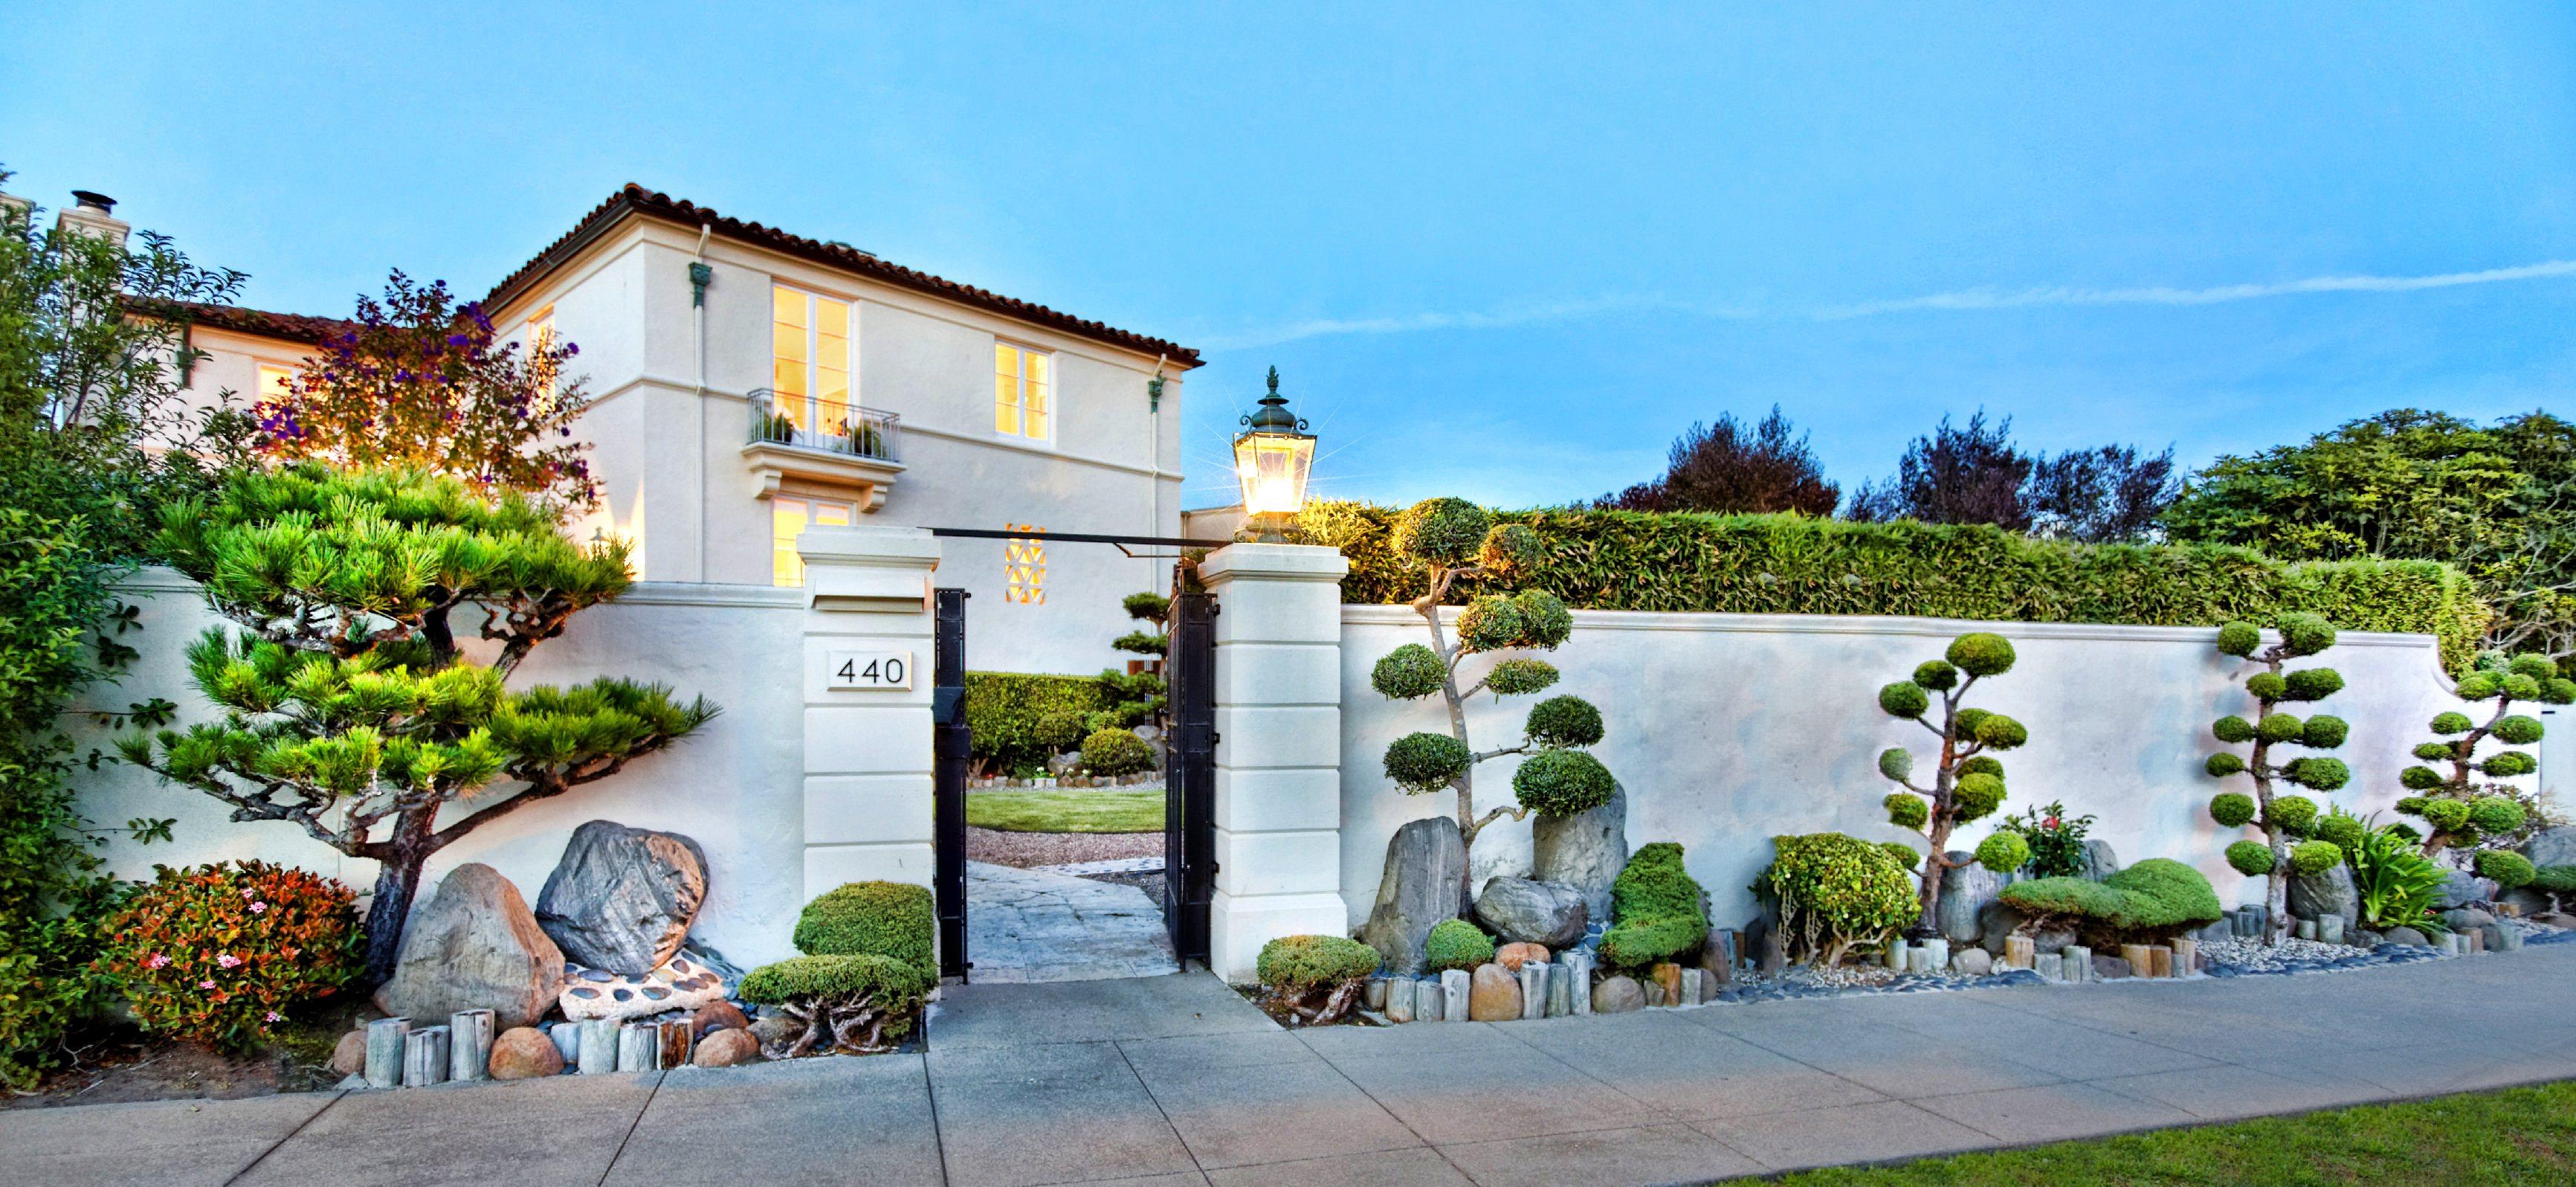 Robert R. Callan Jr. - McGuire Real Estate image 14